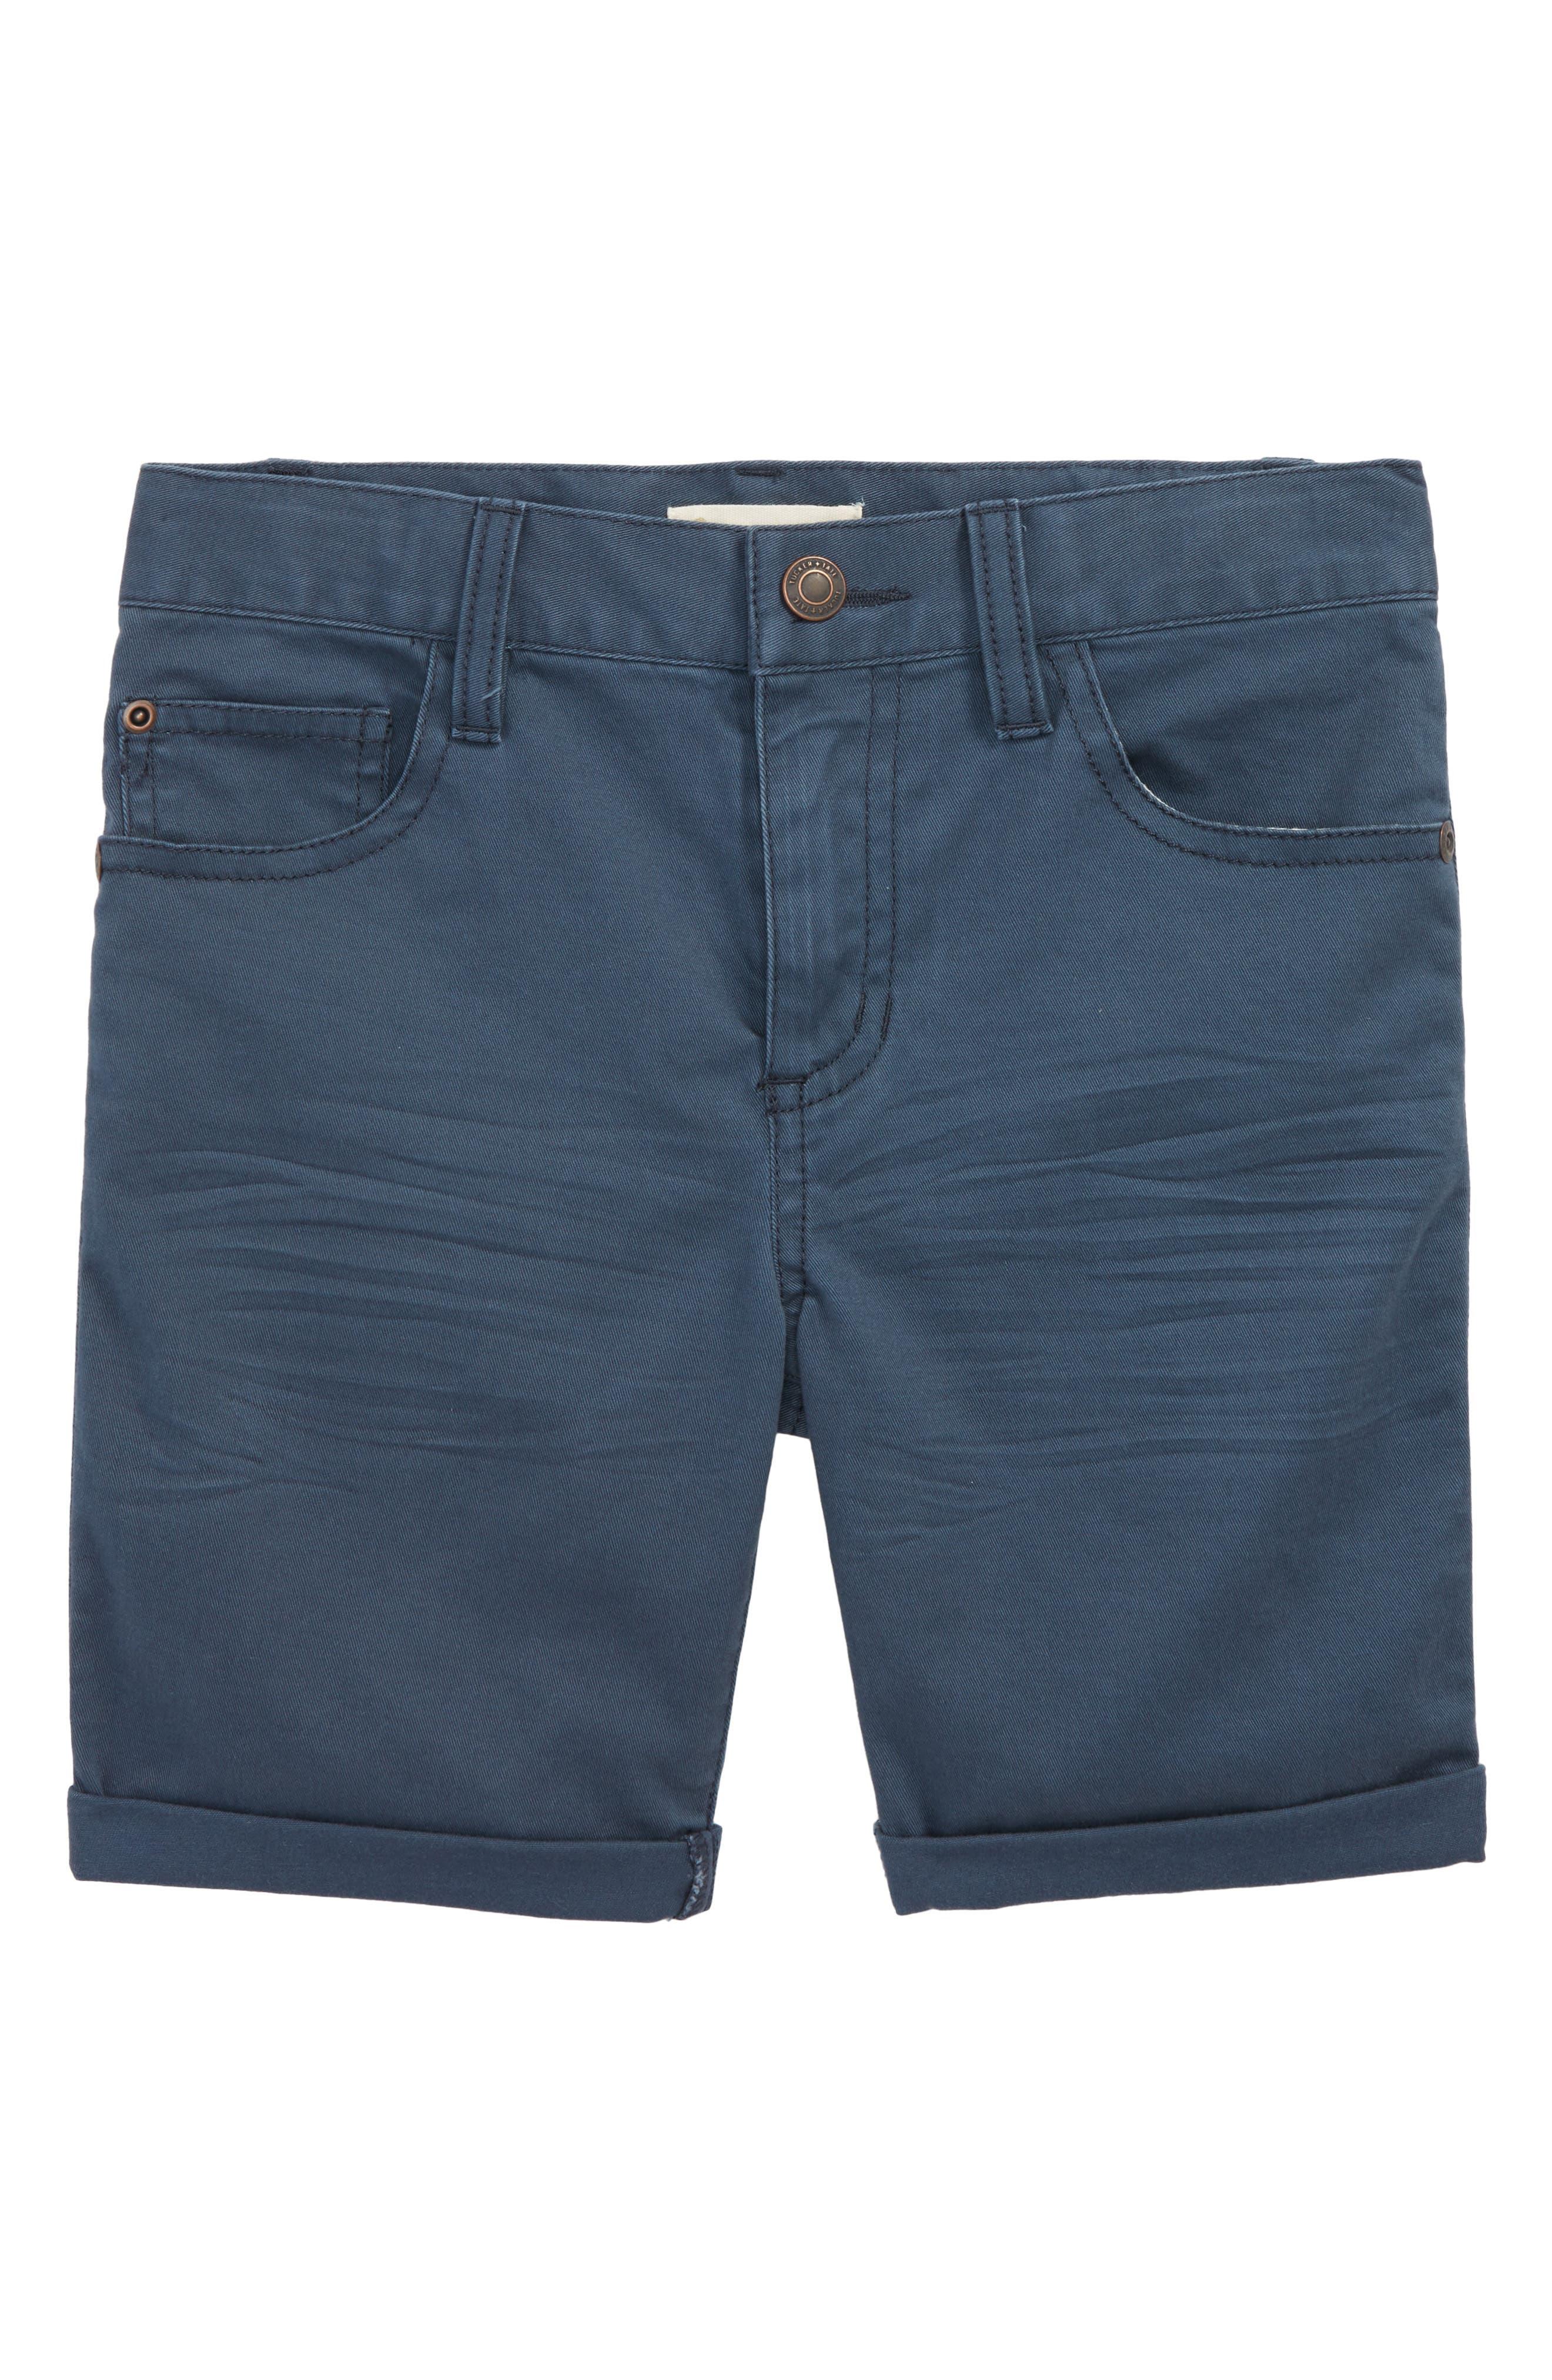 Stretch Twill Shorts,                         Main,                         color, Navy Midnight